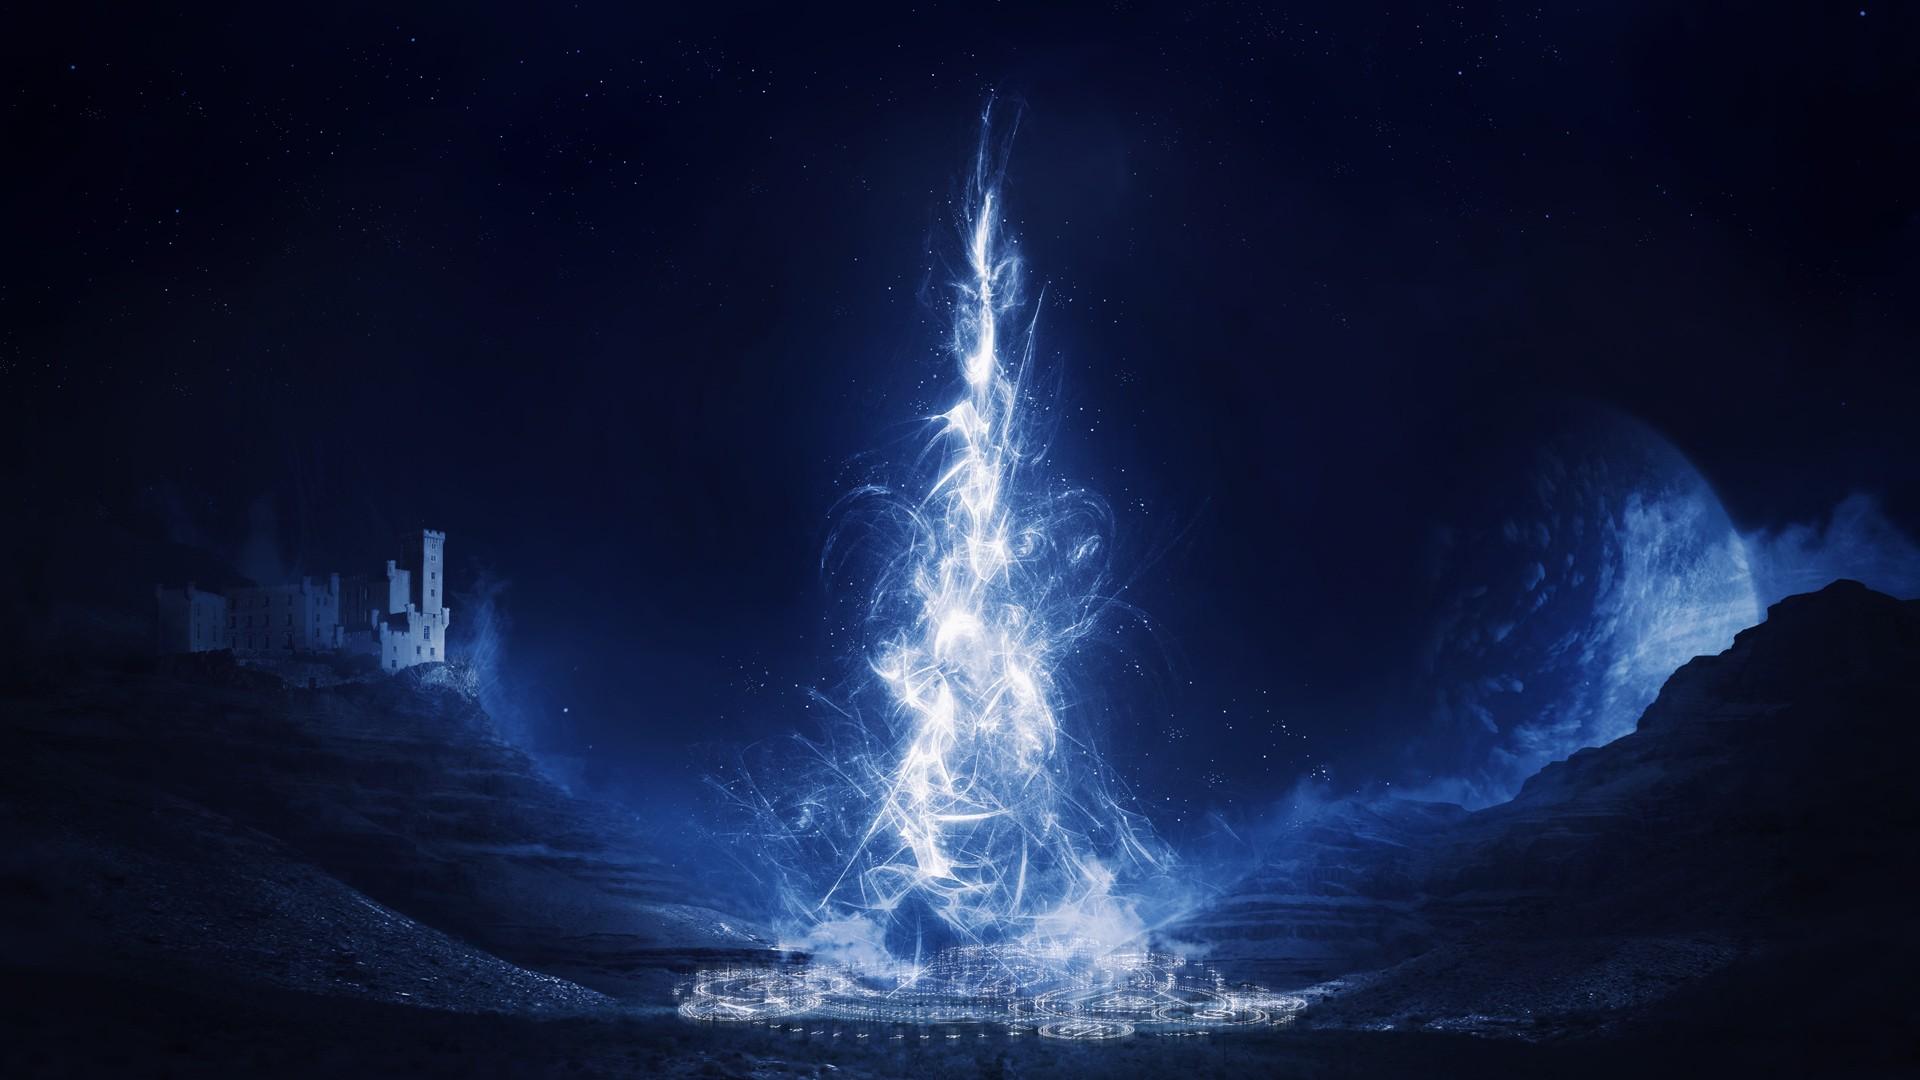 1920x1080 px blue castle fantasy magic night